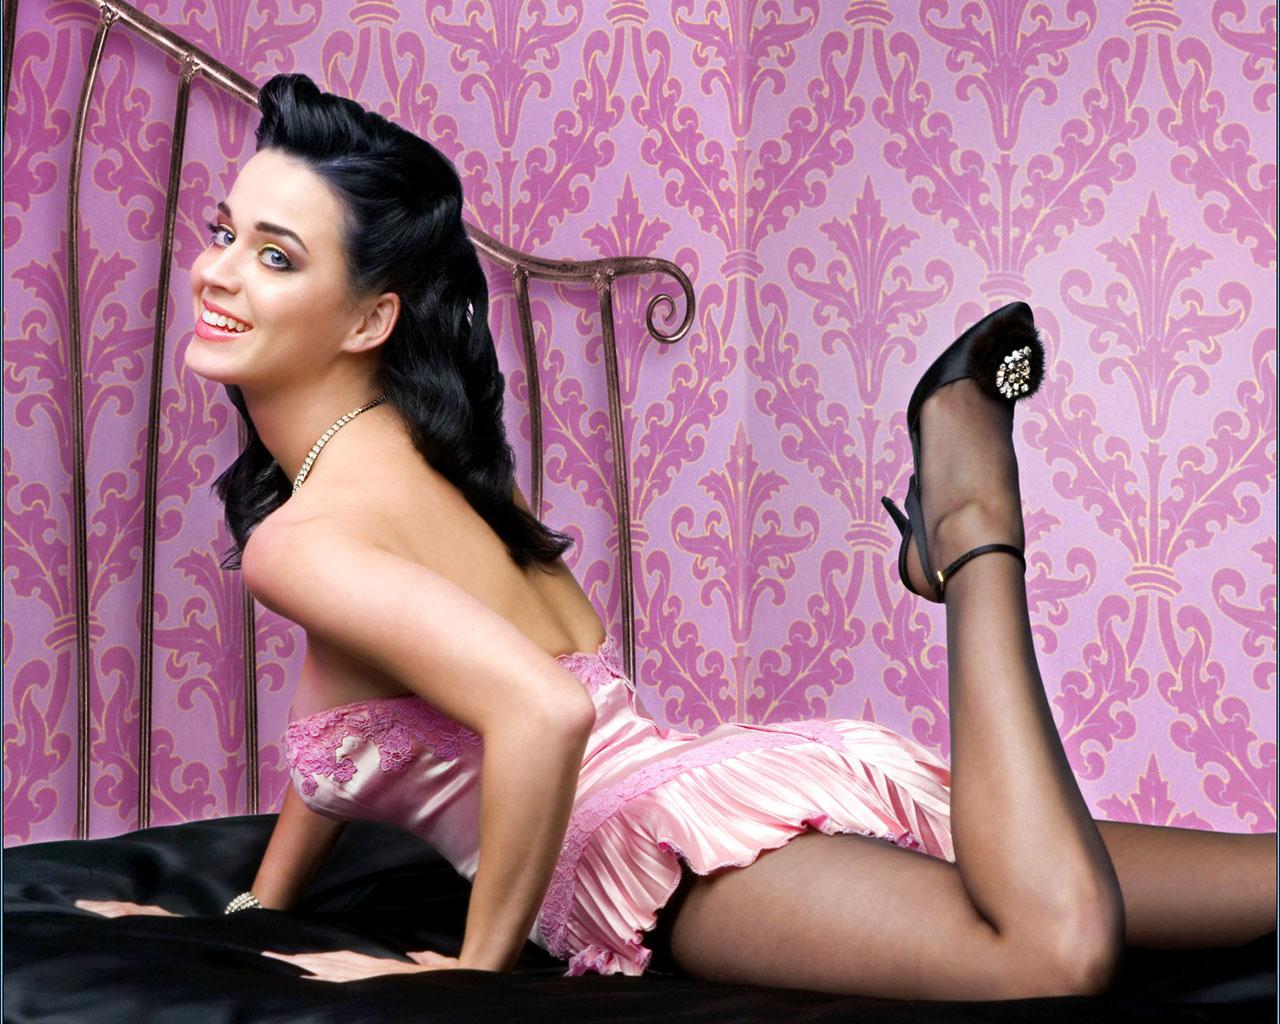 http://1.bp.blogspot.com/-nOZOxft3APw/TZZio7VXQcI/AAAAAAAAMQs/x8p-mbBgY5k/s1600/katy-perry-sexy-1.jpg